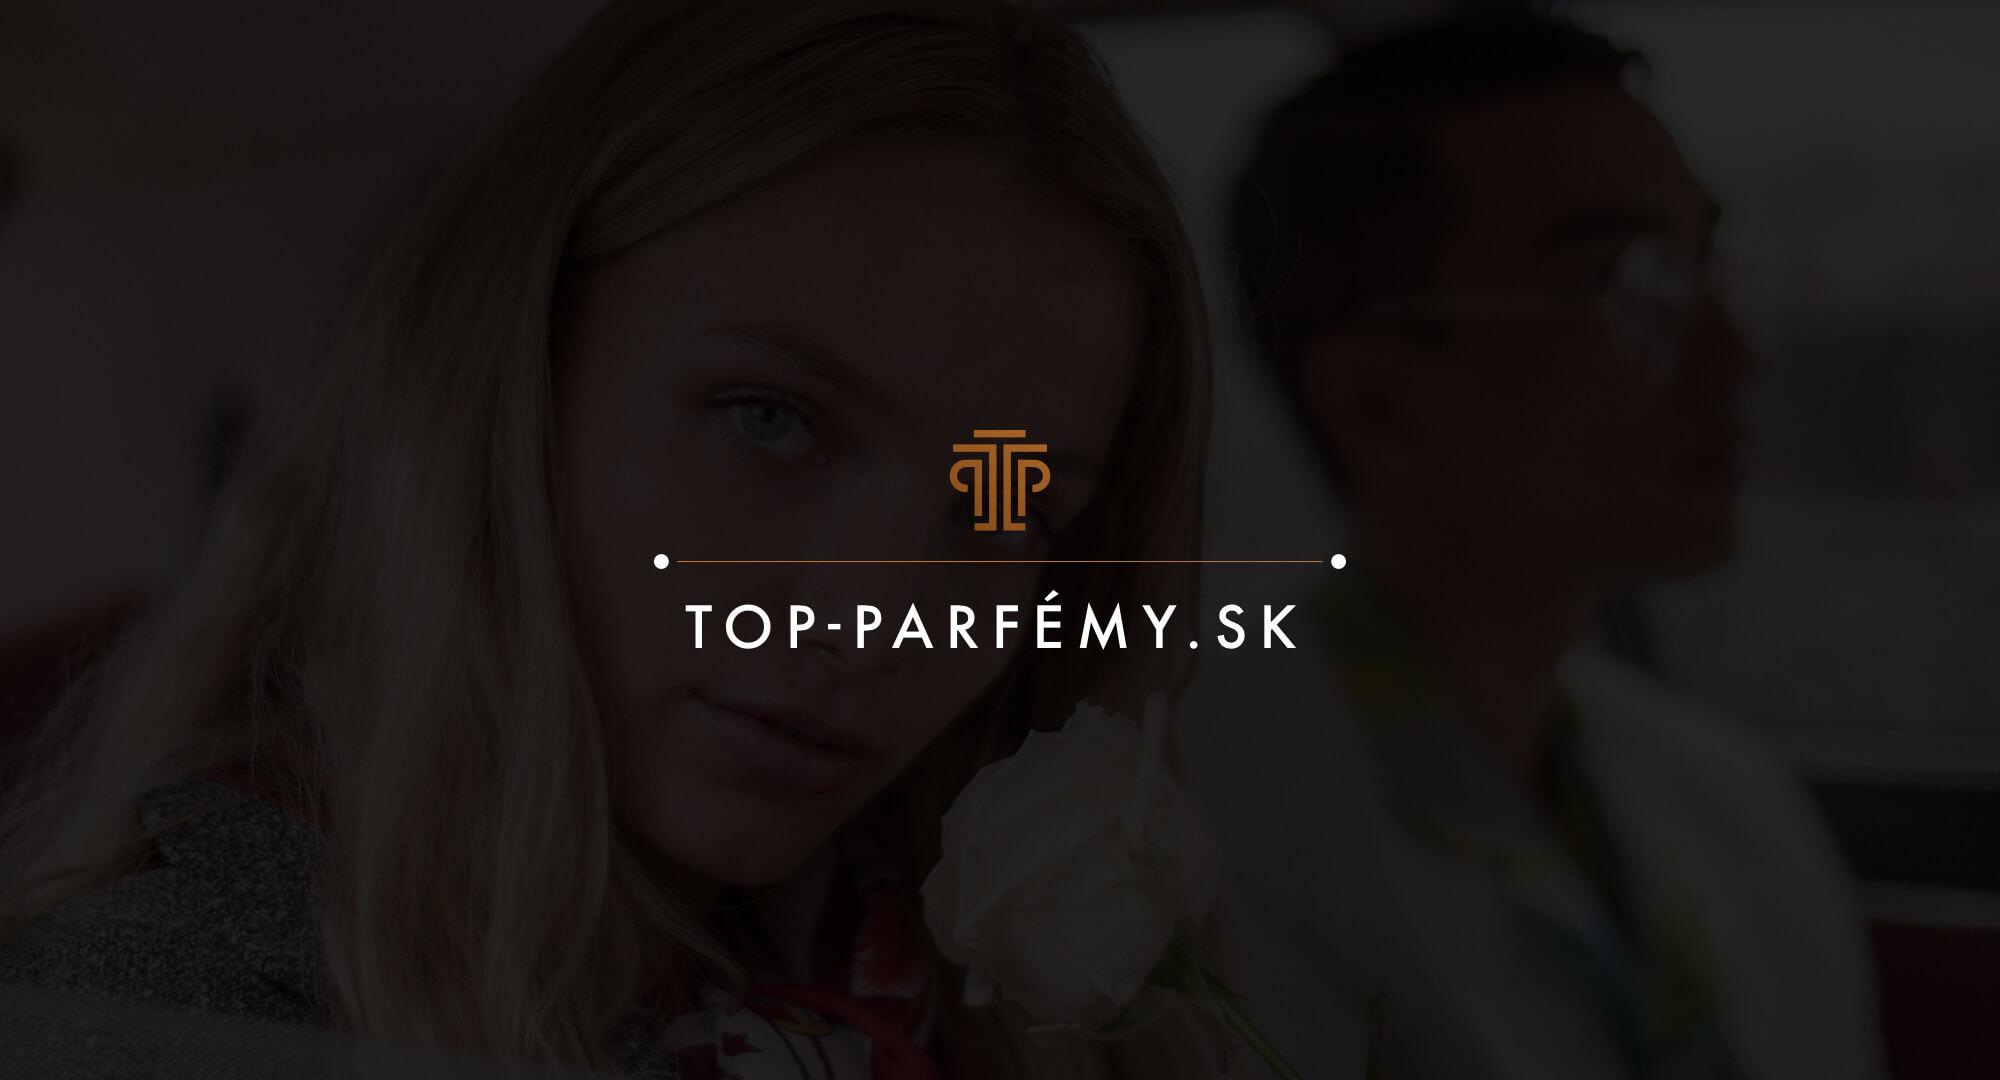 top-parfemy.sk logo case study branding by michael maleek djibril